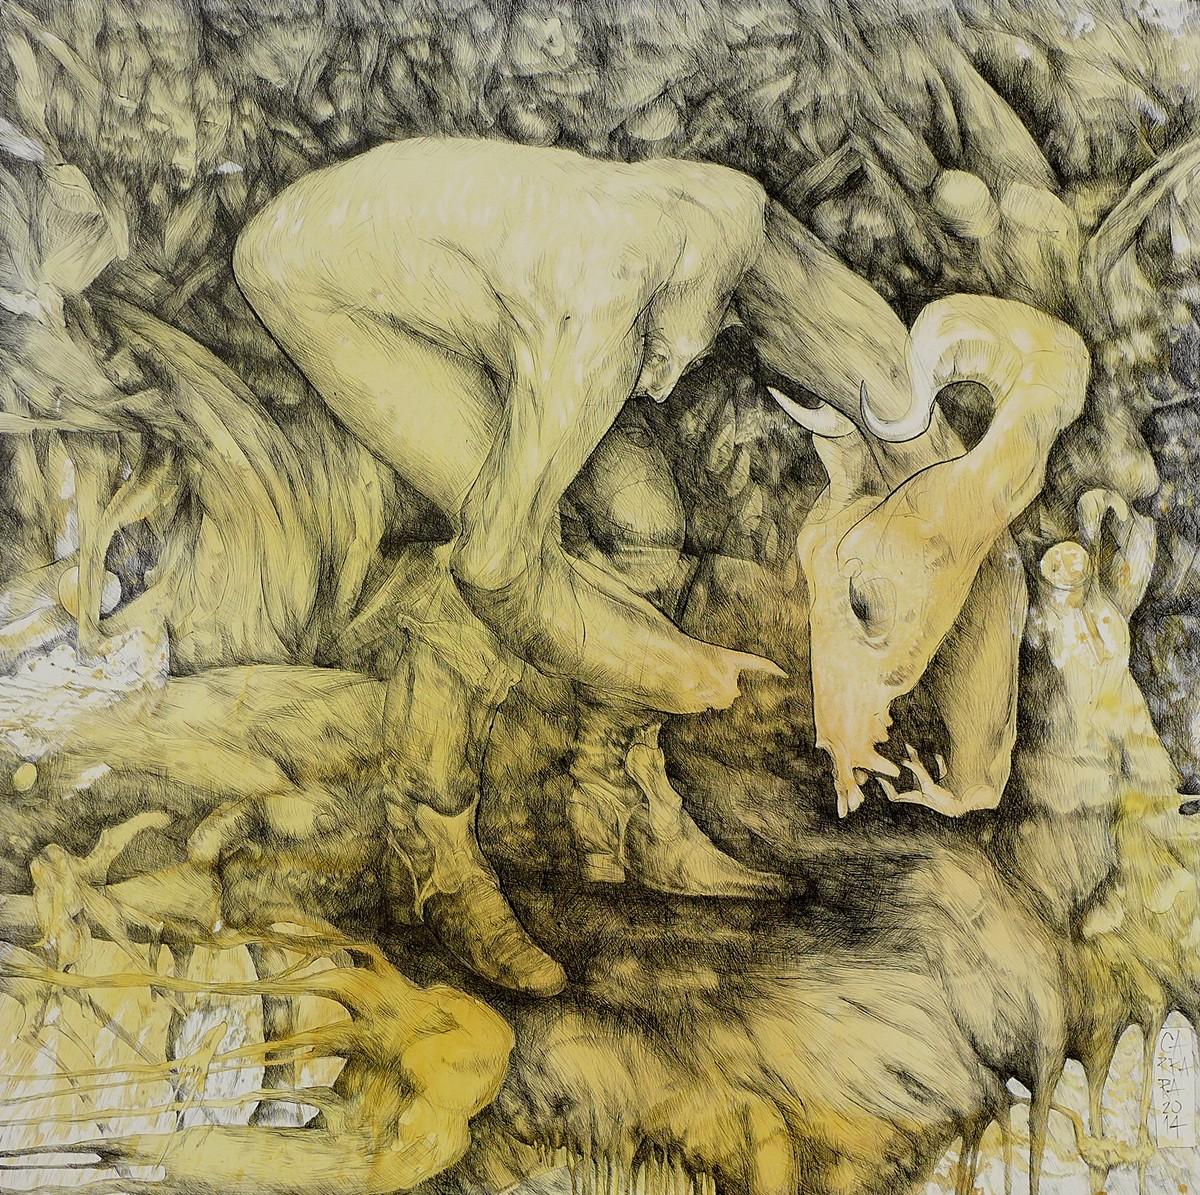 Las botas de Cabeza de Vaca (2014) - Romina Carrara